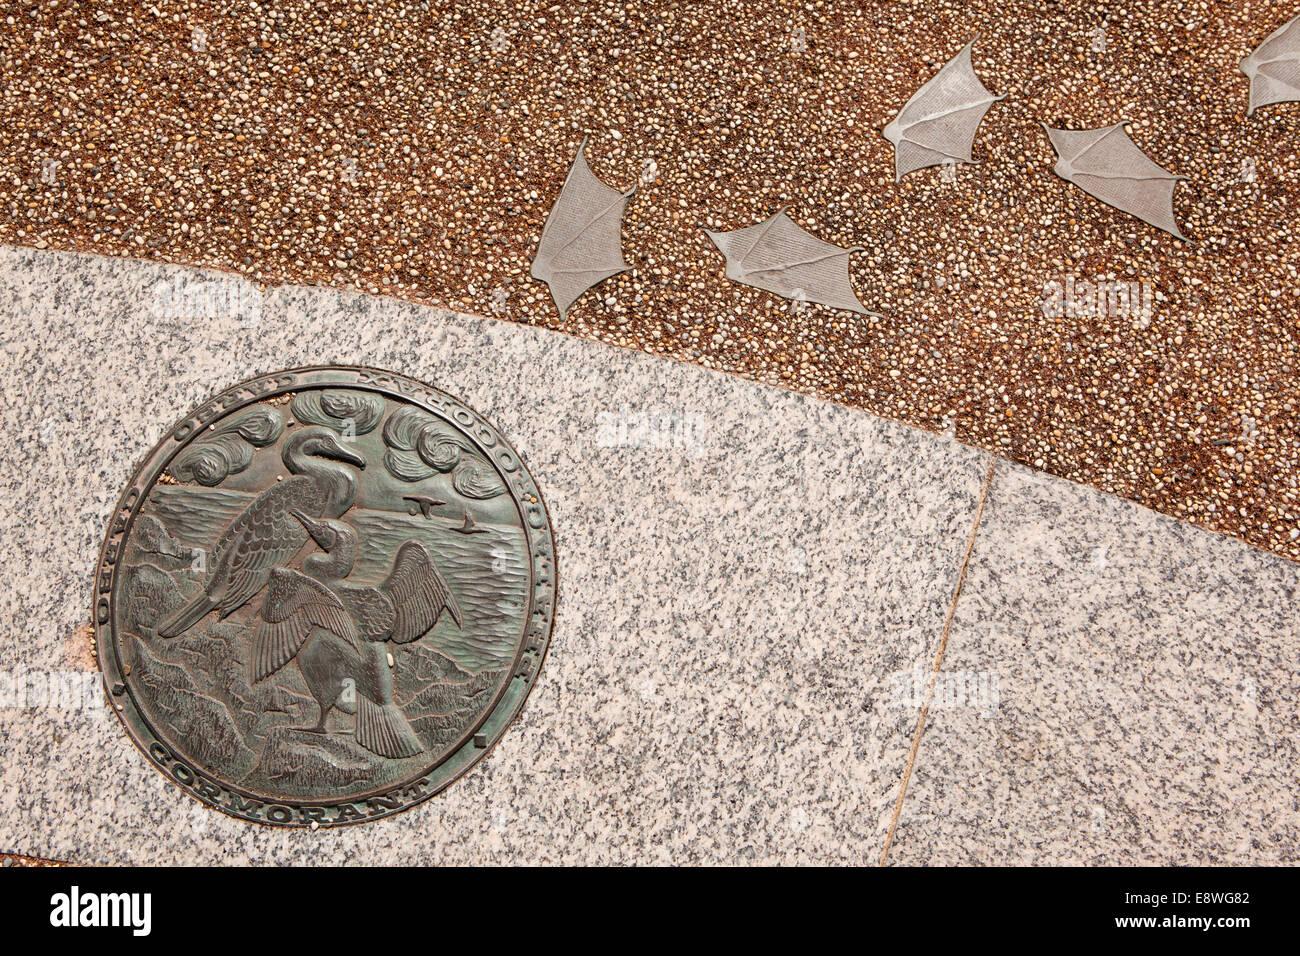 UK, England, Lancashire, Morecambe, Stone Jetty, Tern Project, food chain cormorant bronze sculpture Stock Photo